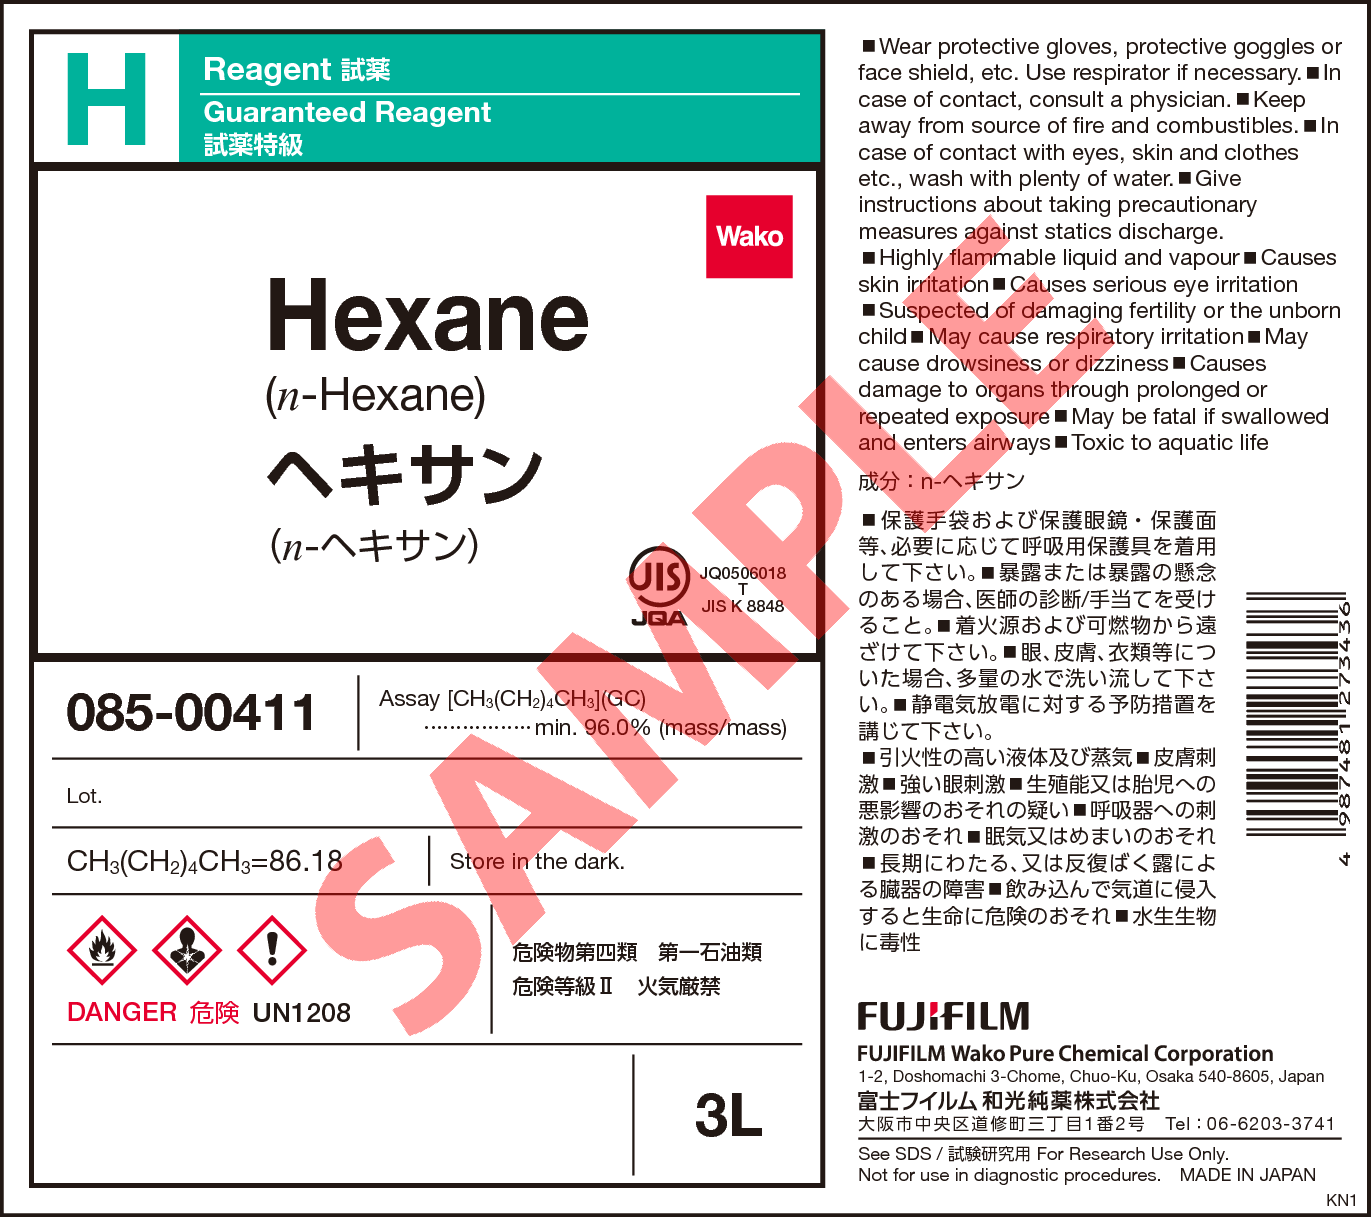 110-54-3・Hexane・085-00411・085-00416[Detail Information] | [Common